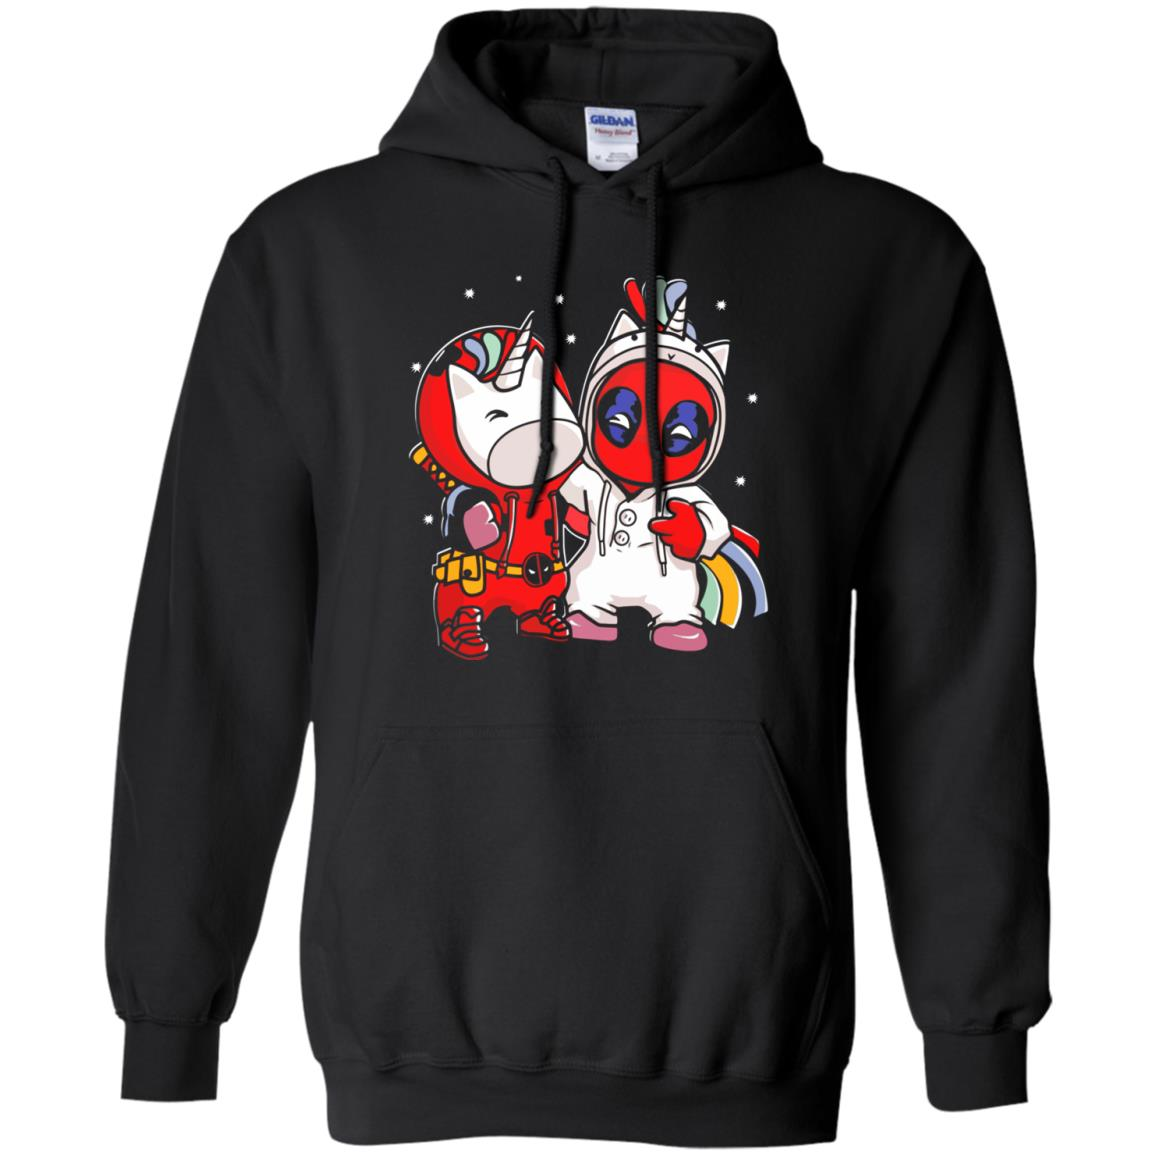 image 1005 - Deadpool swap Unicorn shirt, hoodie, sweater